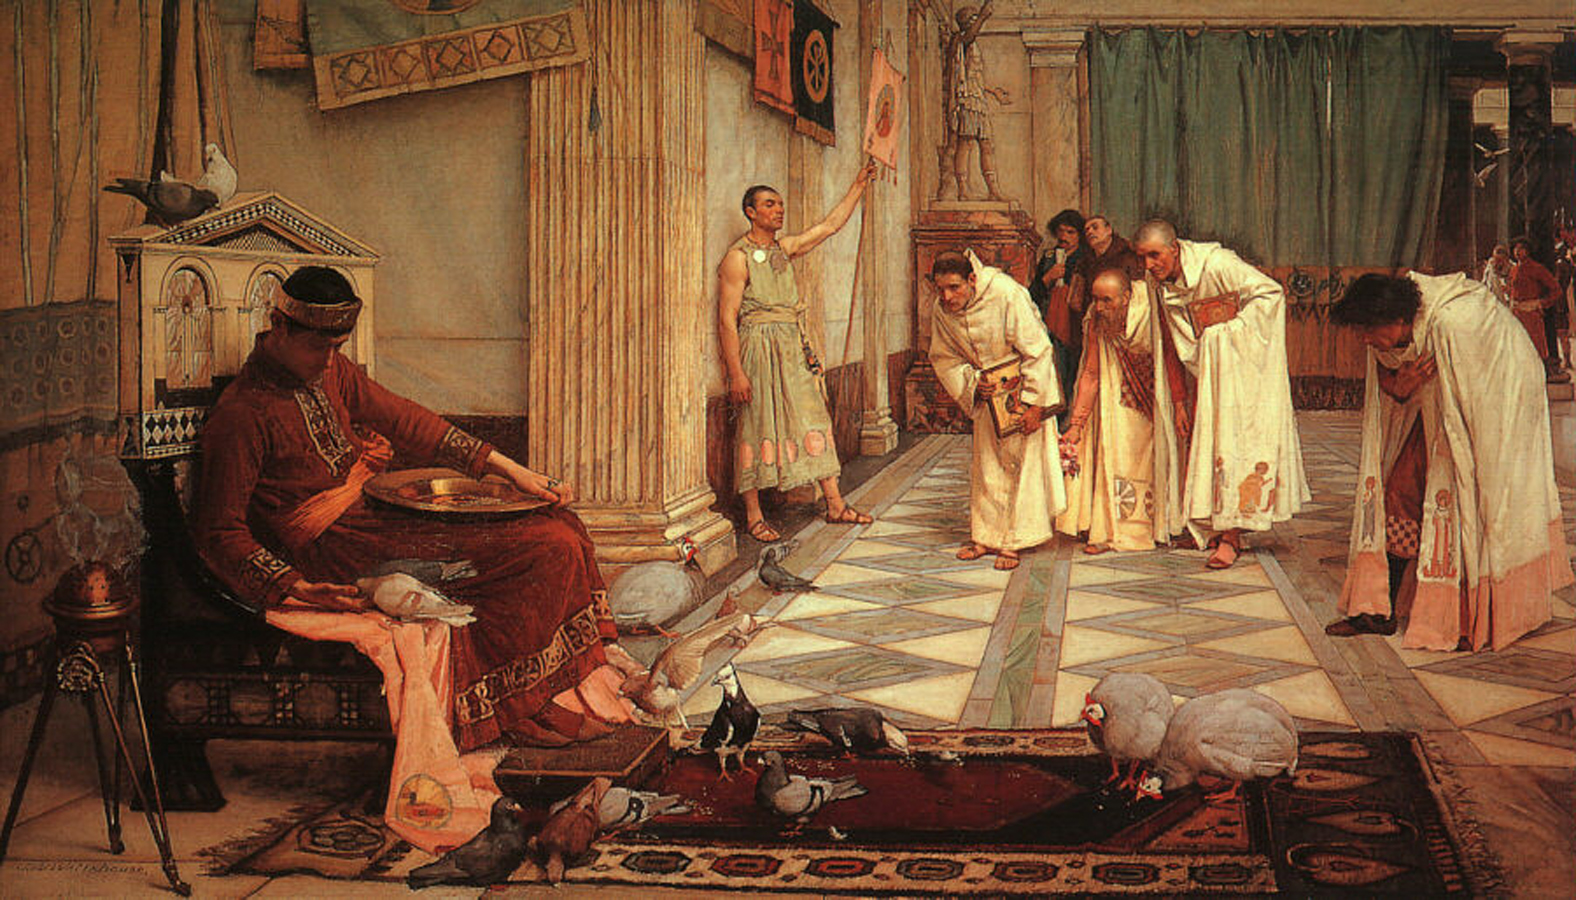 'The Favorites of the Emperor Honorius', by John William Waterhouse, 1883.